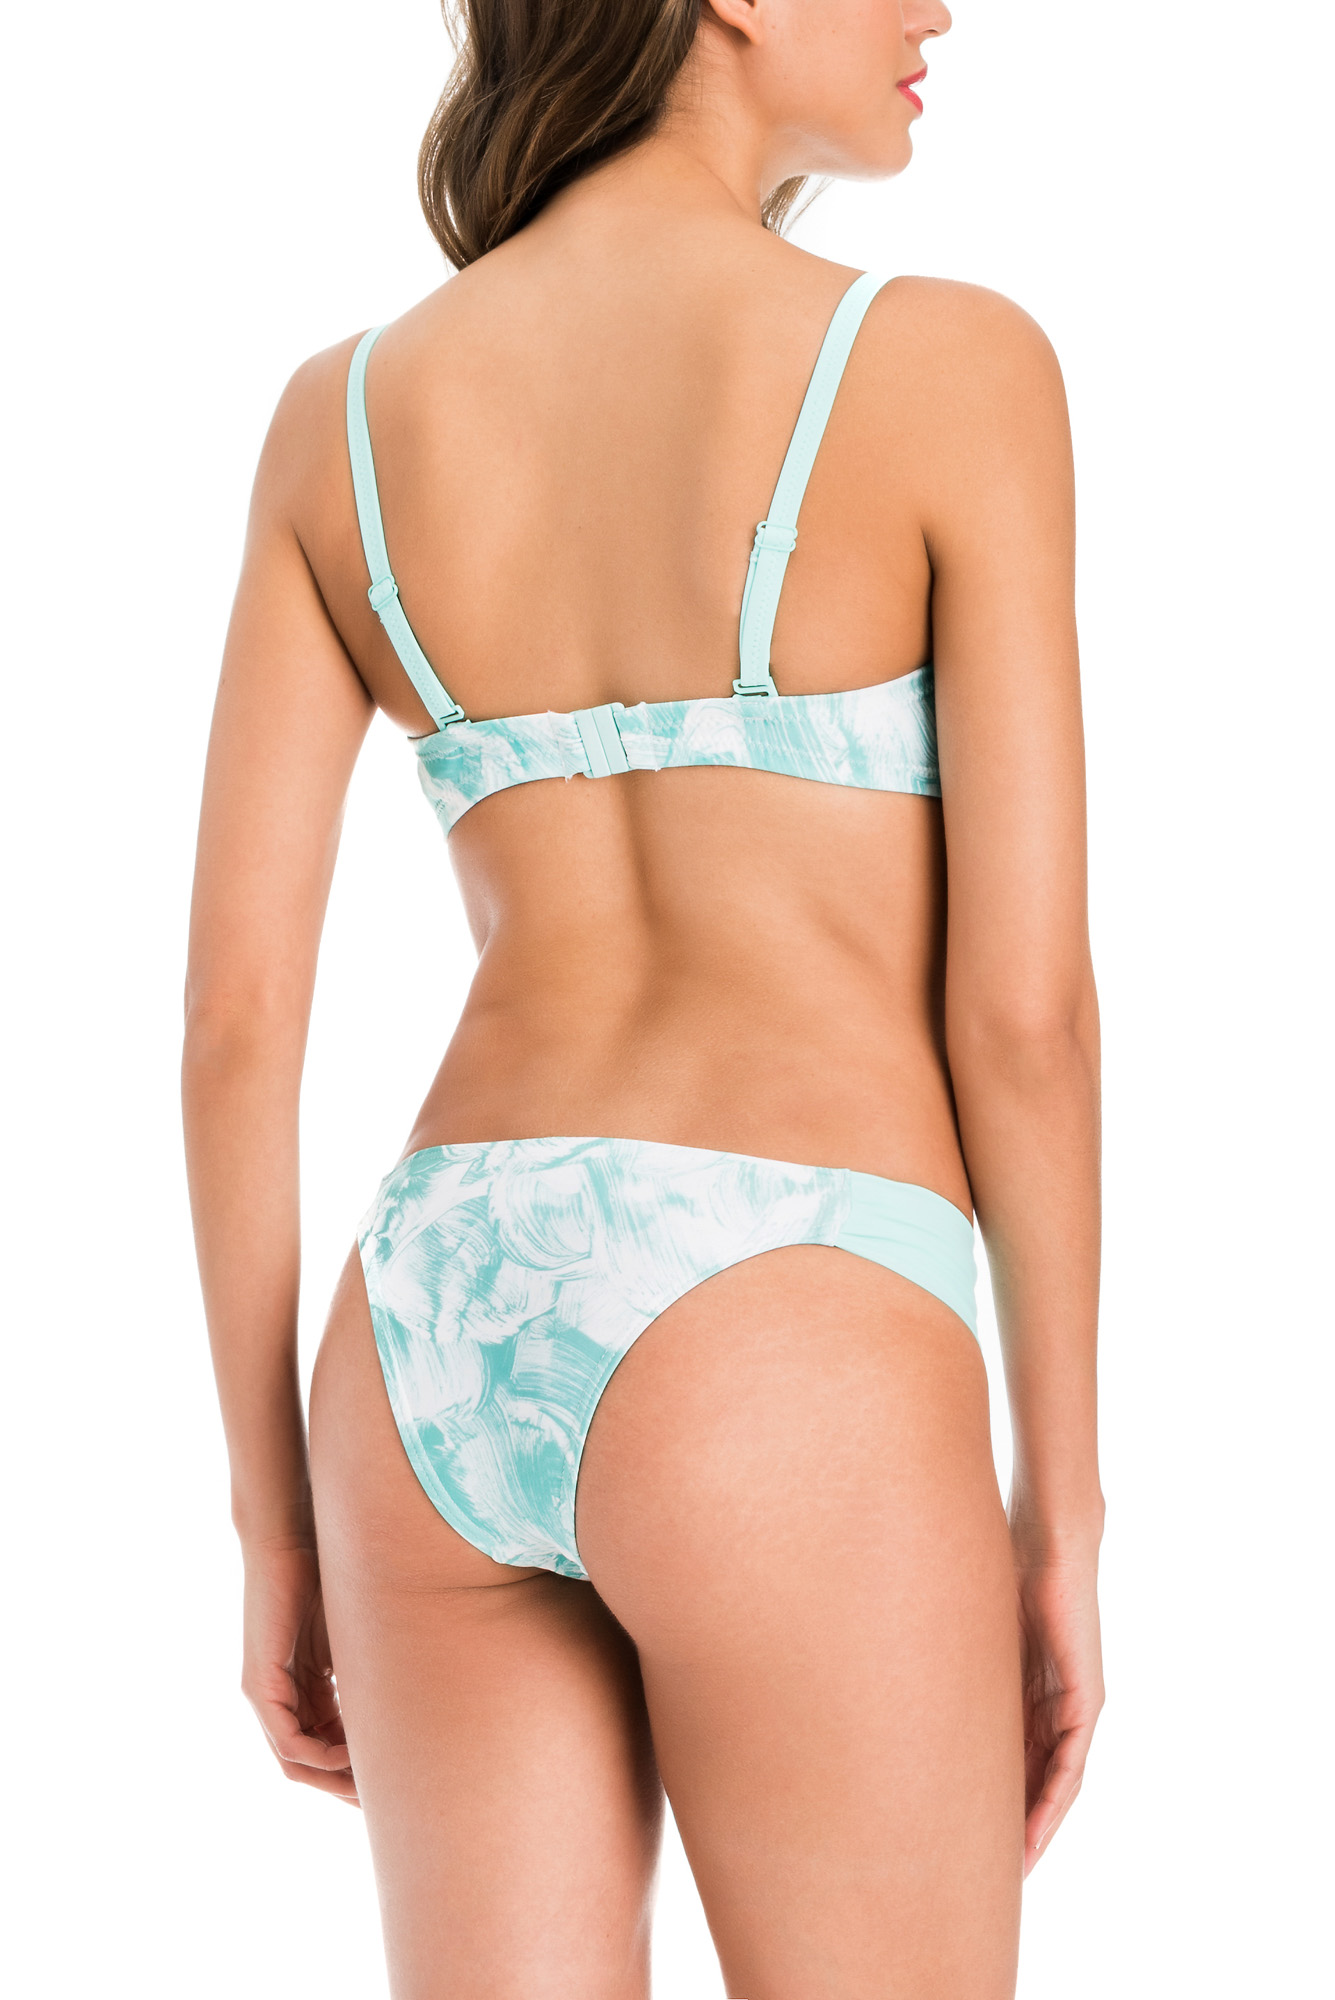 e-commerce bikini fotografia fotografo porto estudio swim swimwear-8.jpg